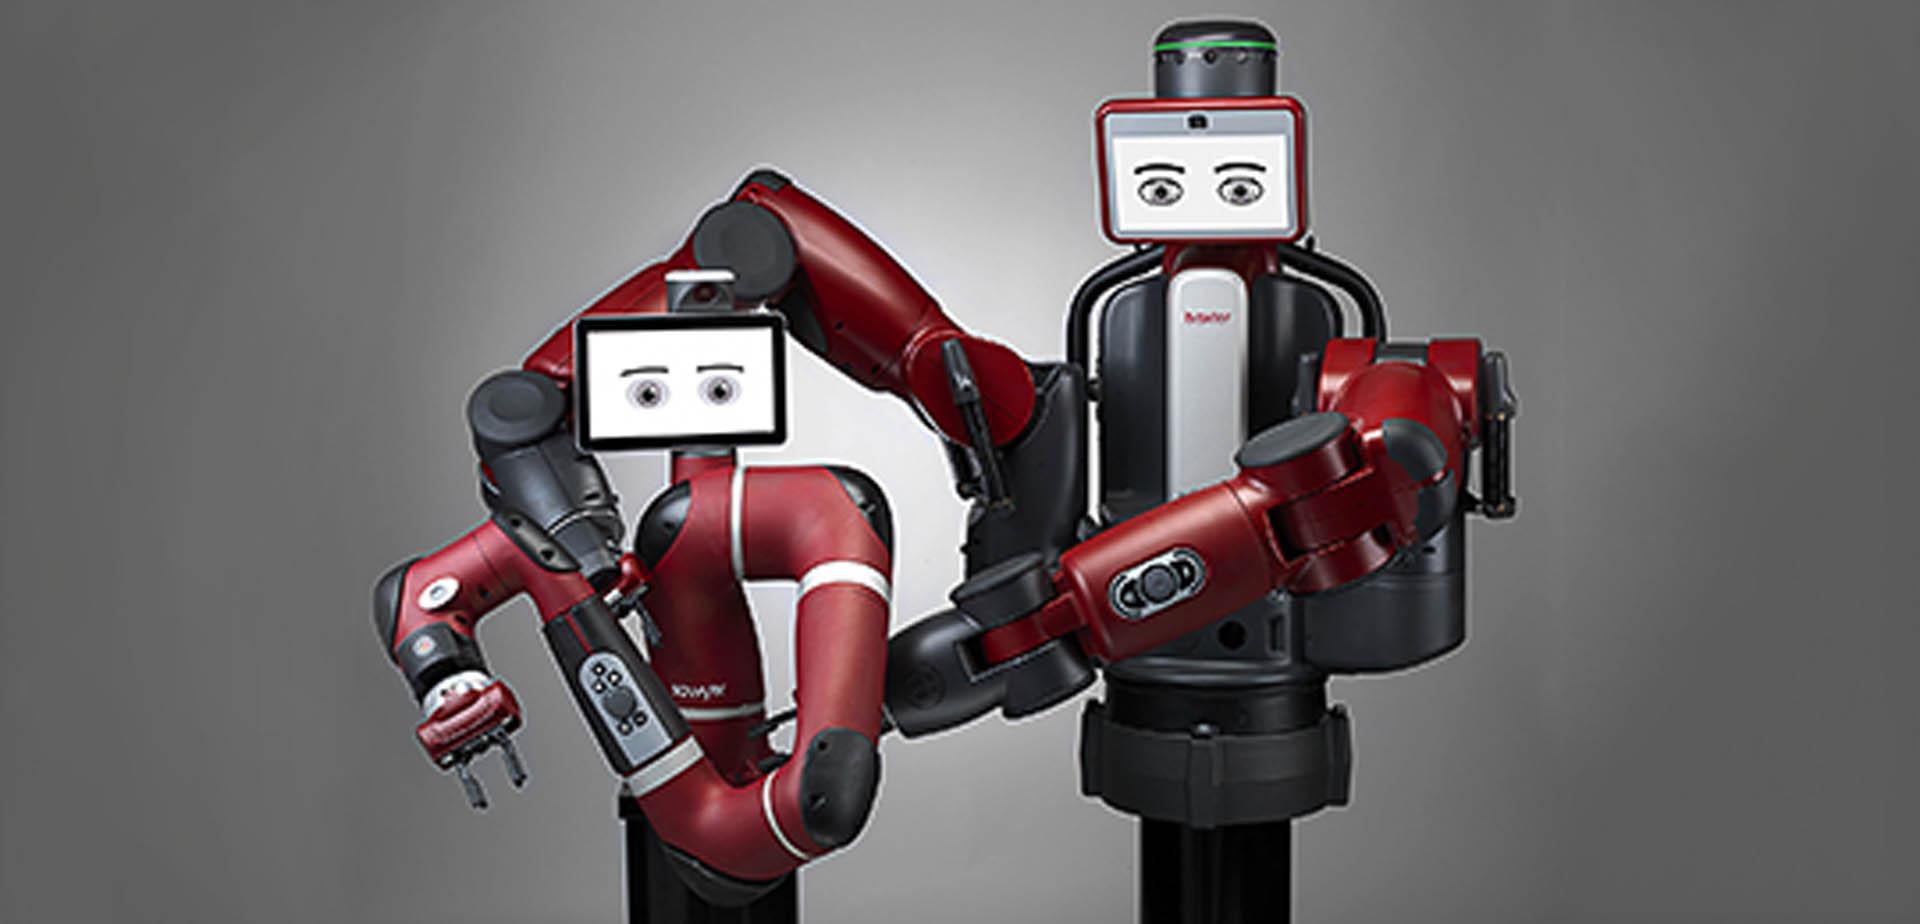 Sawyer和Baxter机器人